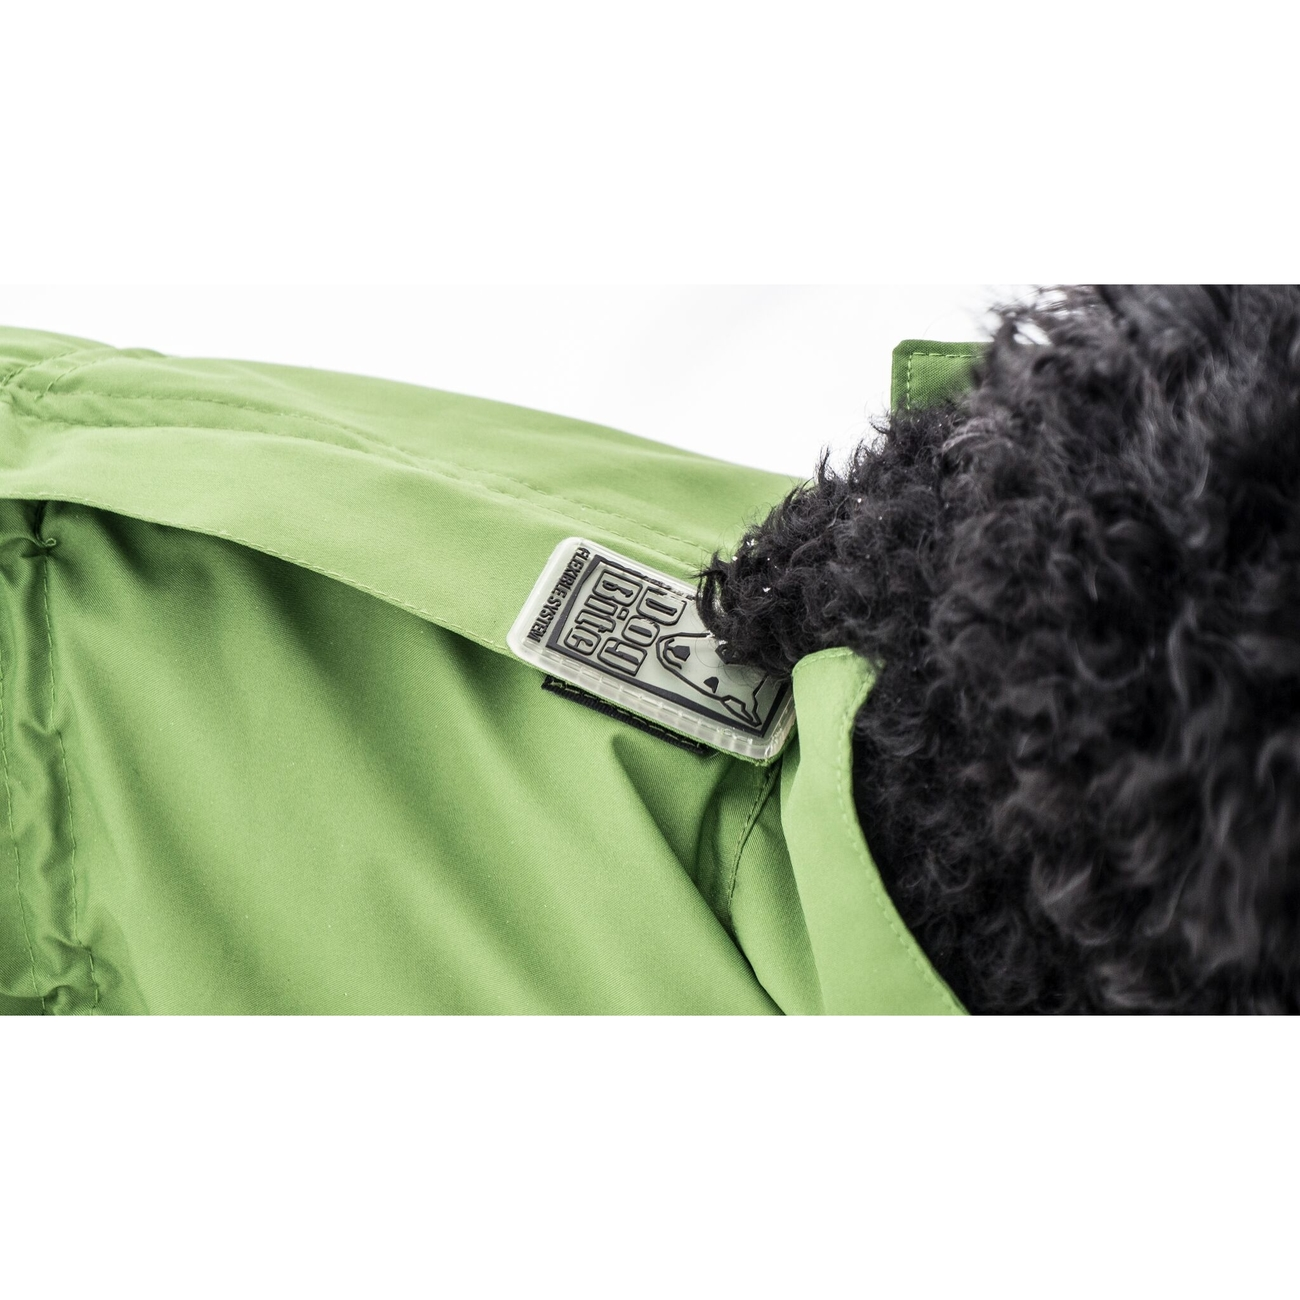 DogBite Hunde Ganzjahres Regenjacke Matt, Bild 2